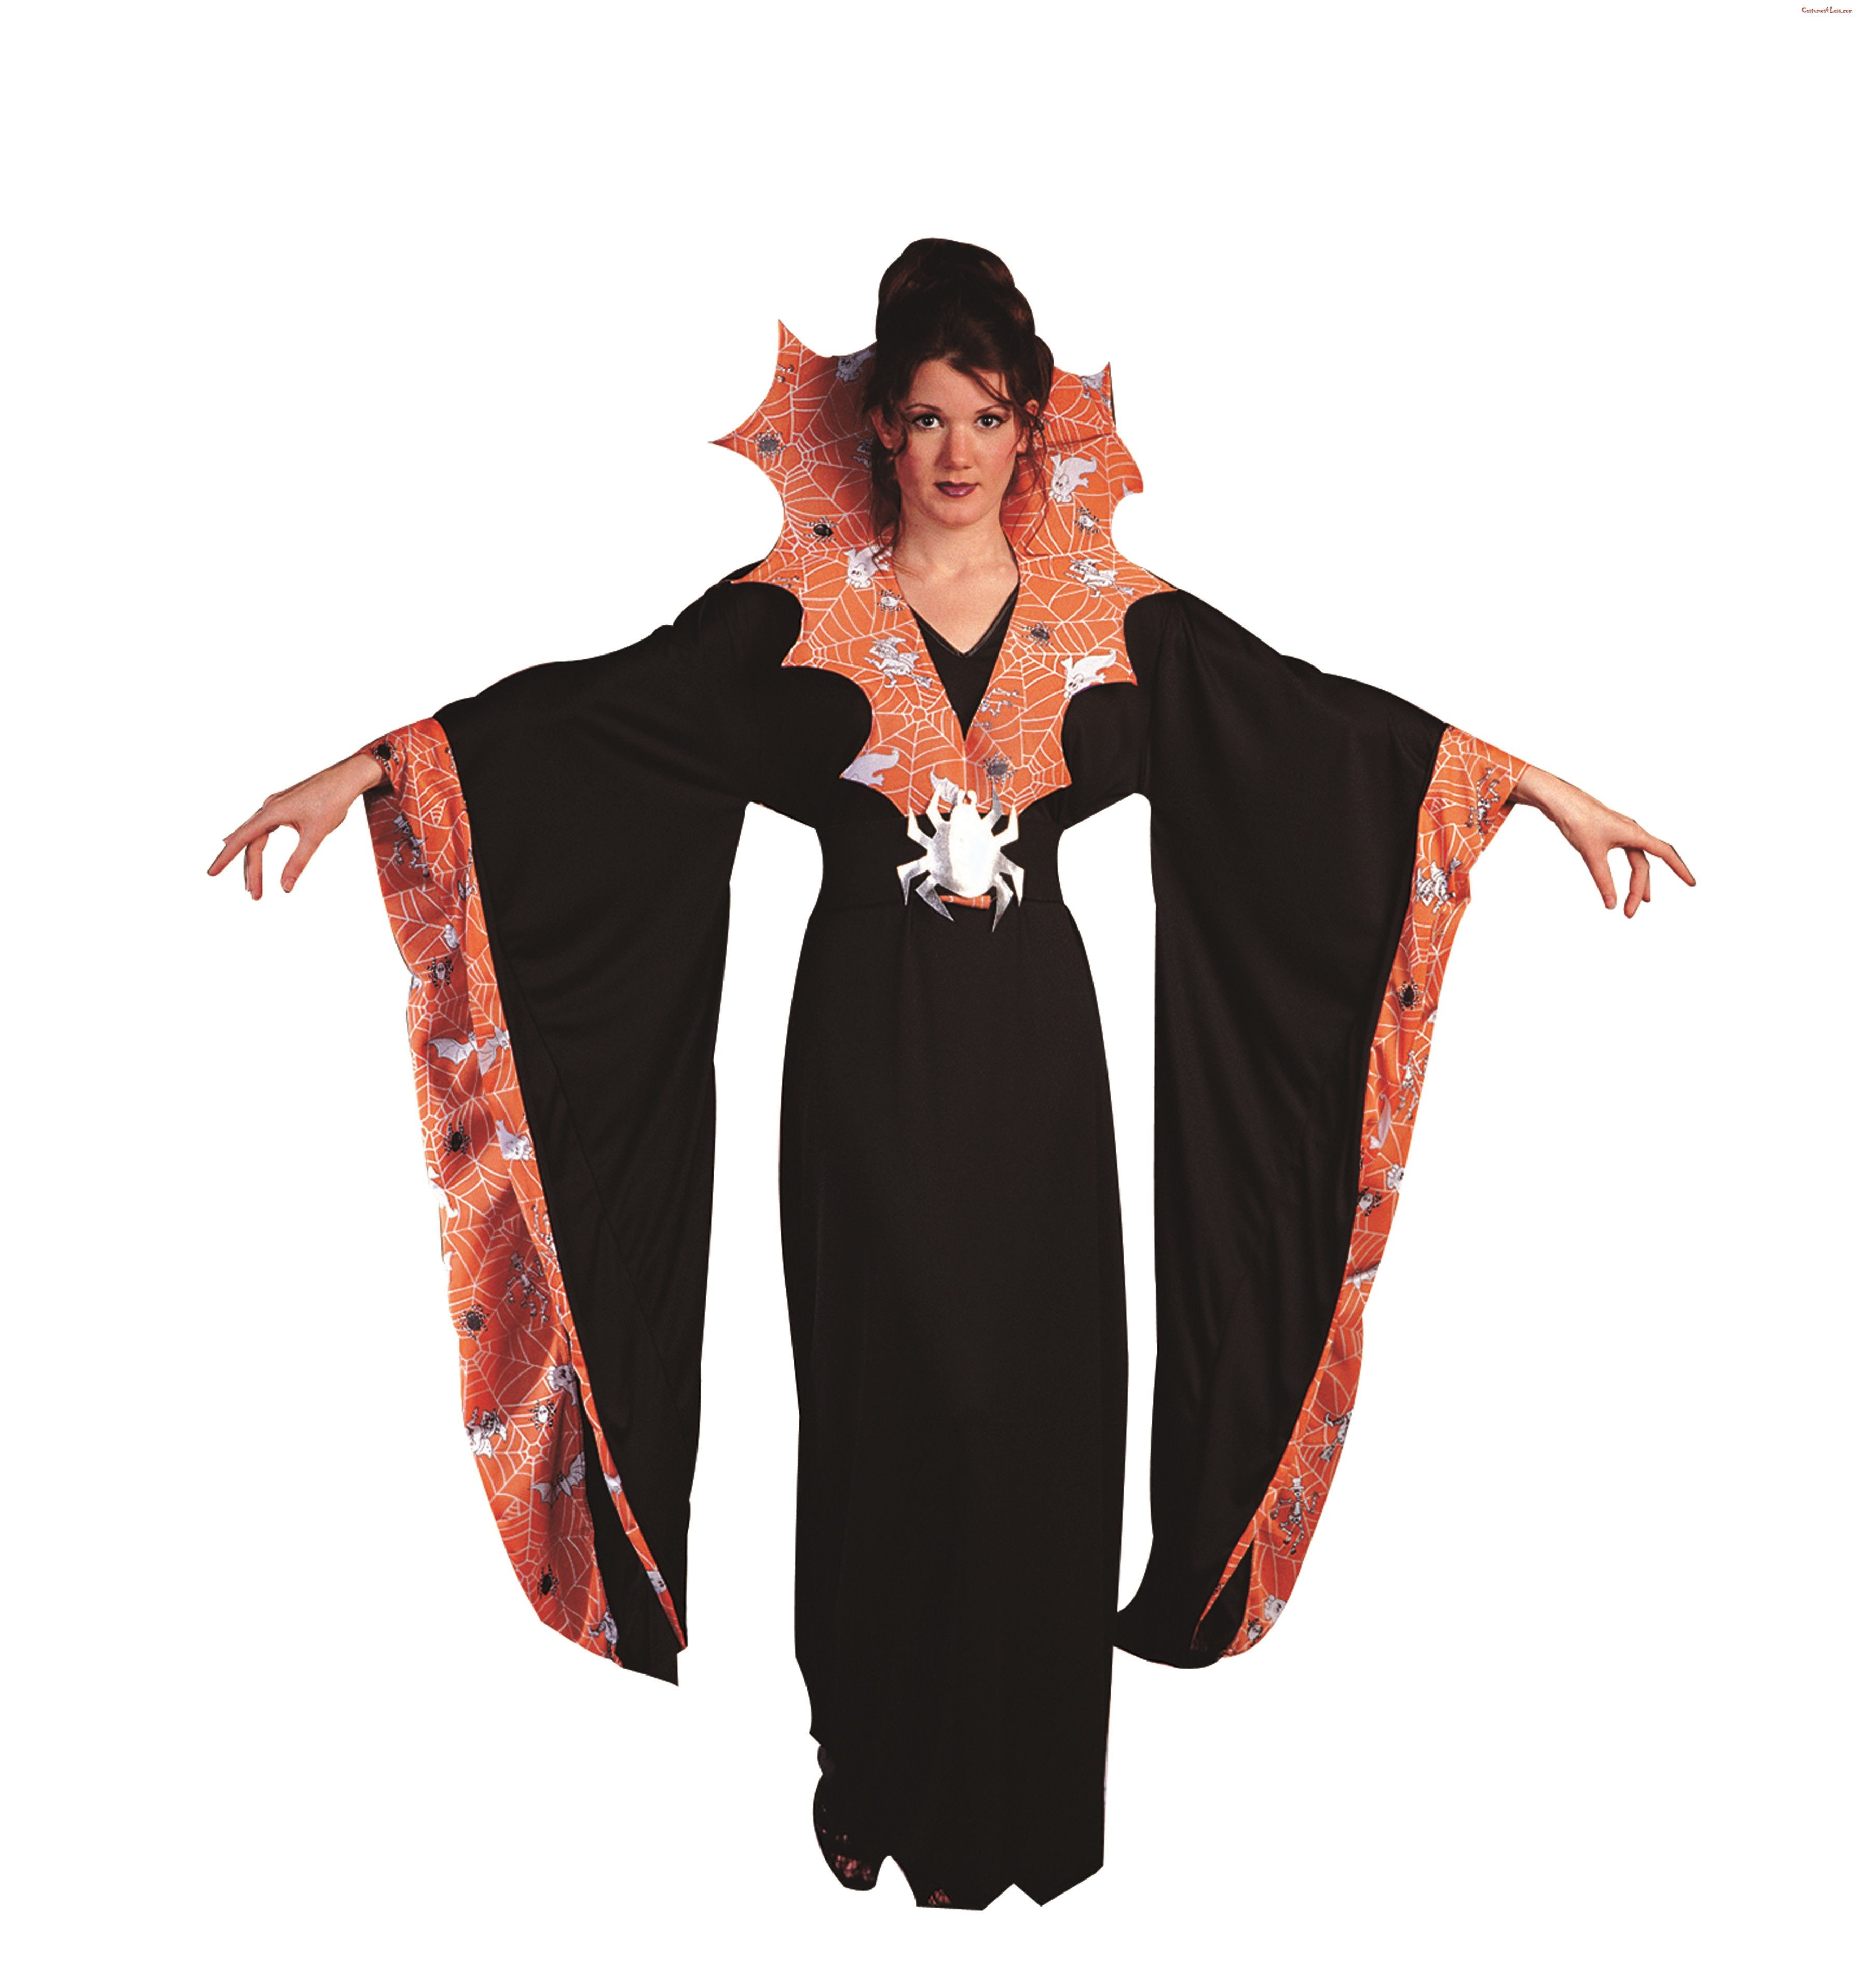 Spider Mistress Ad Couple Halloween Costumes Halloween Costume Puns Couples Costumes